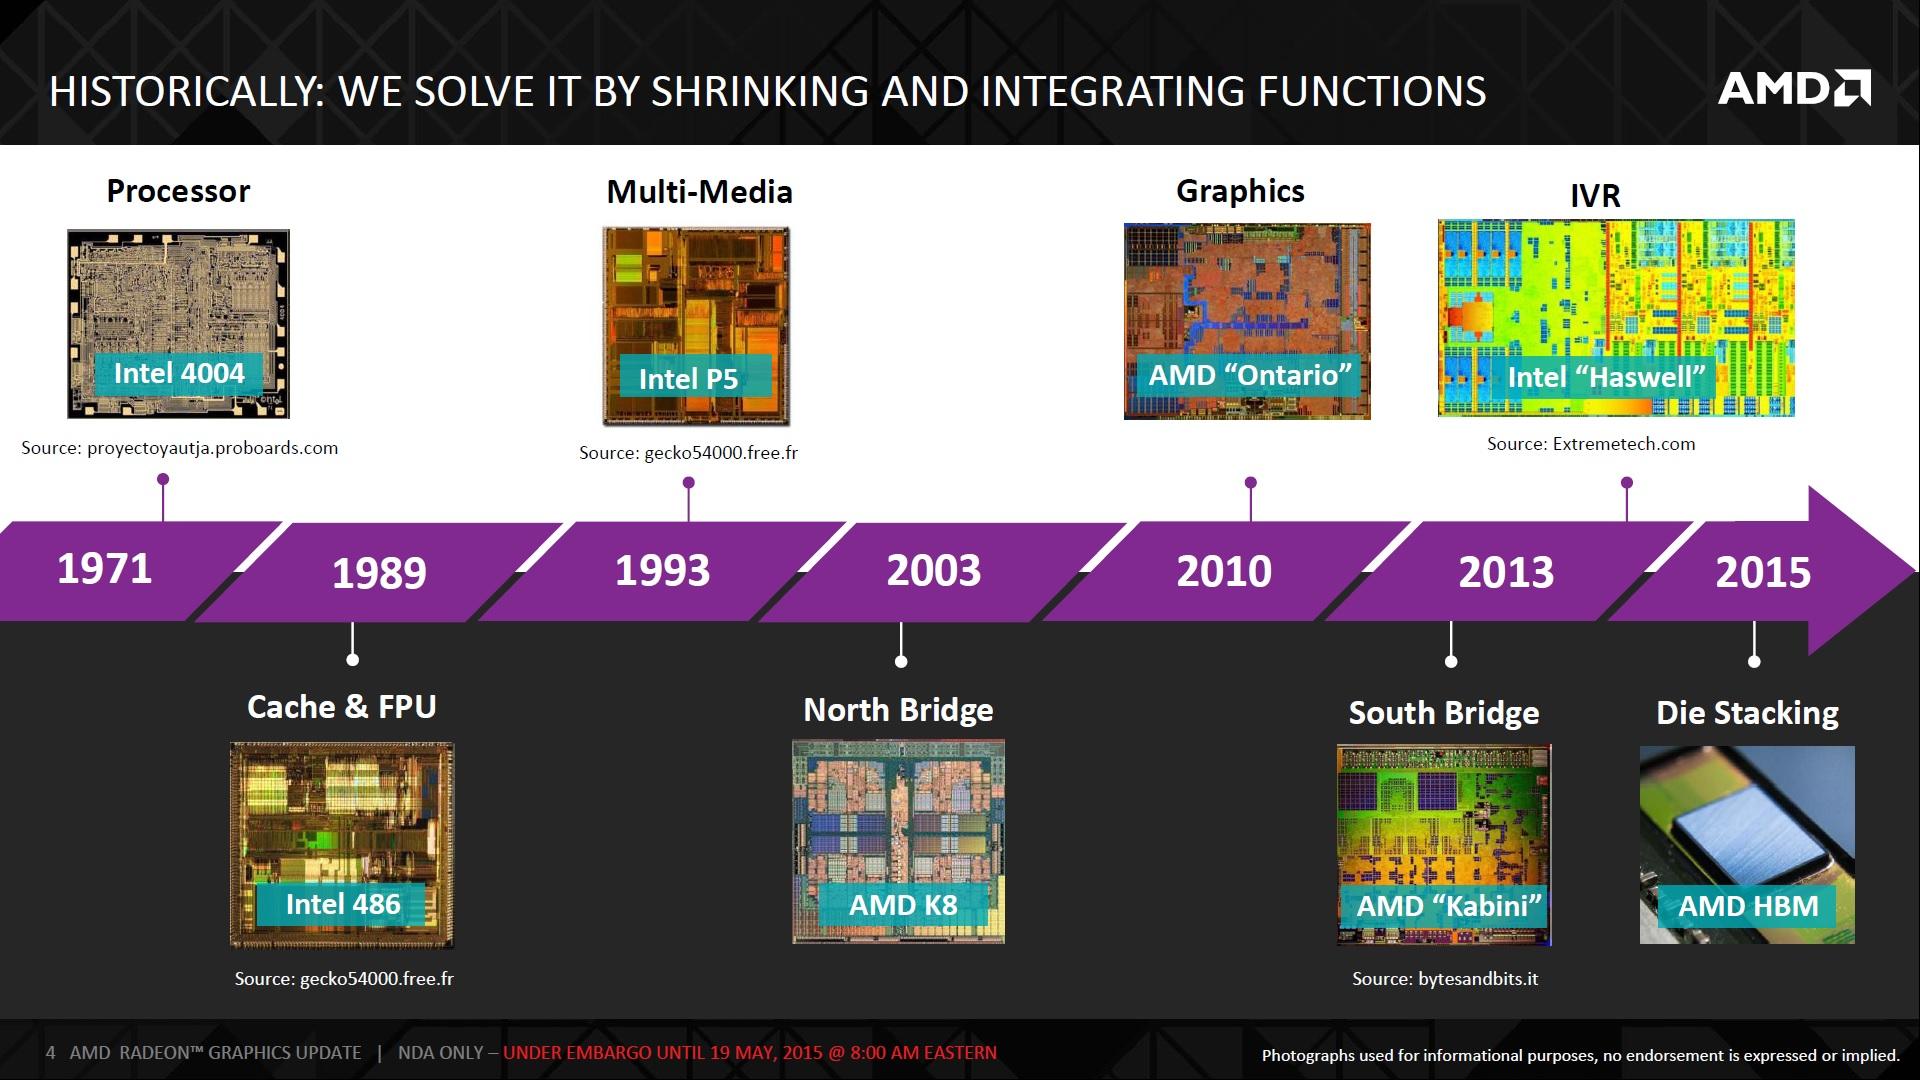 AMD HBM 4